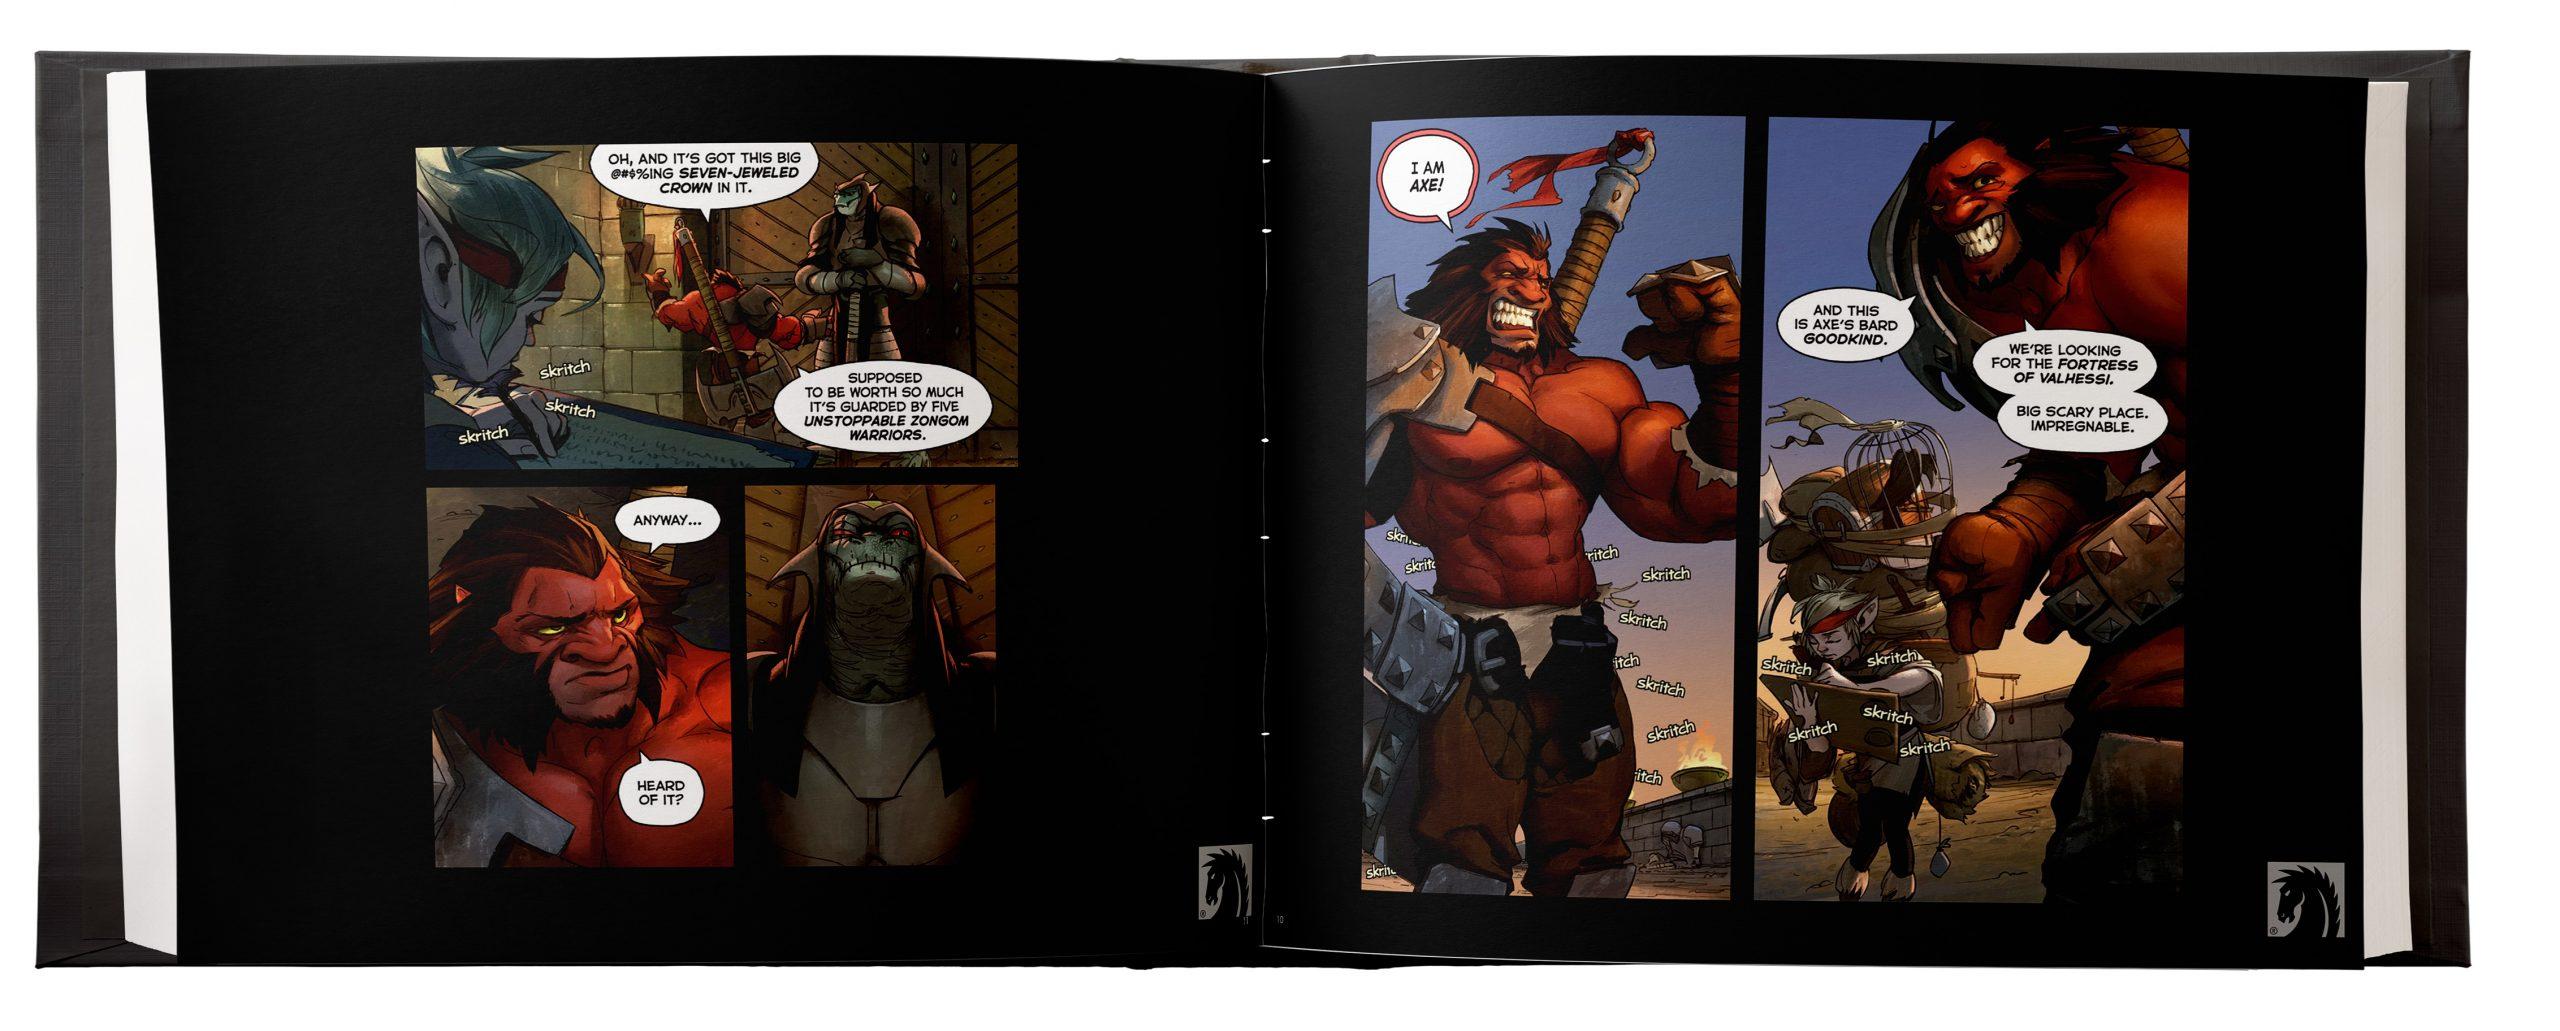 На CrowdRepublic стартовал сбор средств наиздание комикса Dota 2. The Comic Collection 1